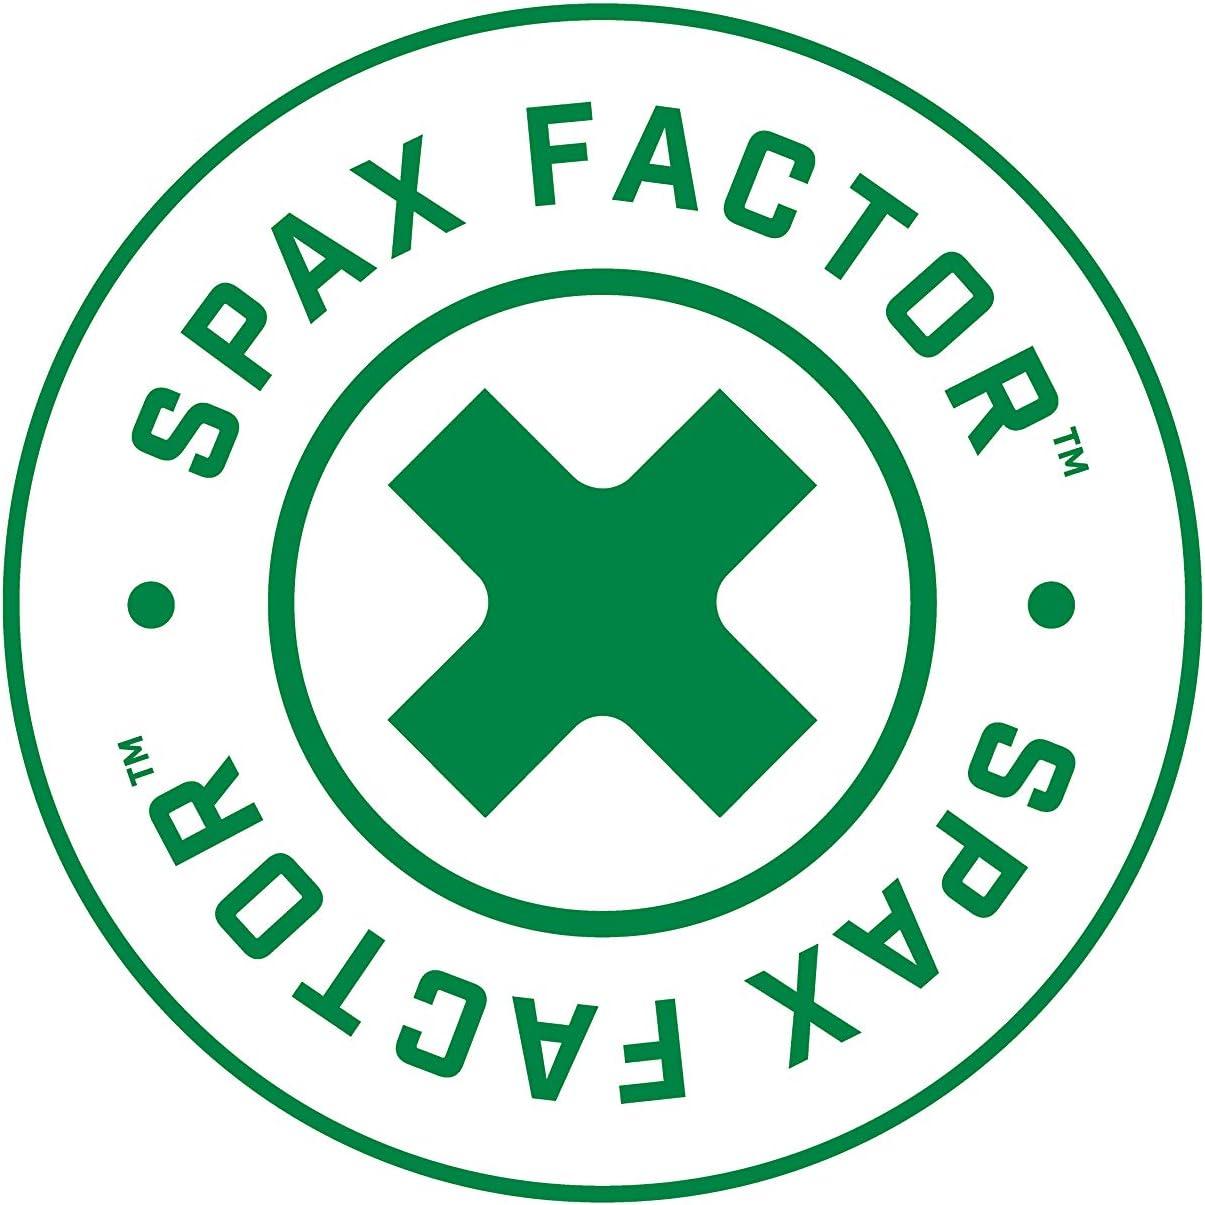 Spax 4581020701525 1//4 x 6 T-Star Drive Washer Head Yellow Zinc PowerLag Screw 50 Pieces per Box